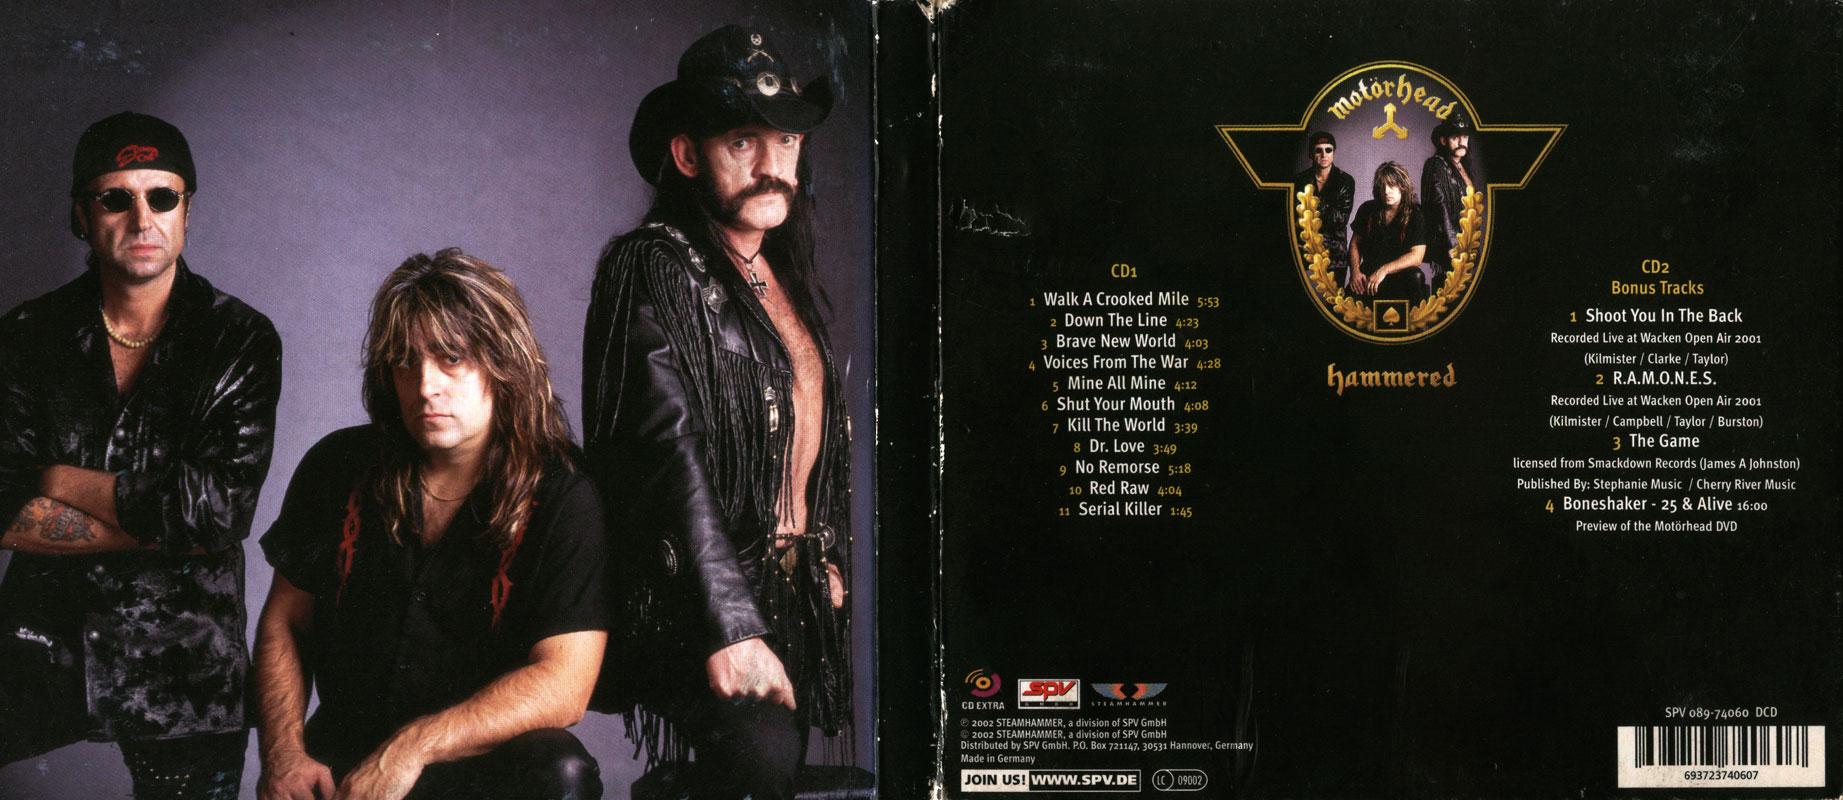 Motörhead - Hammered (2002) [2CD, Limited Edition] / AvaxHome